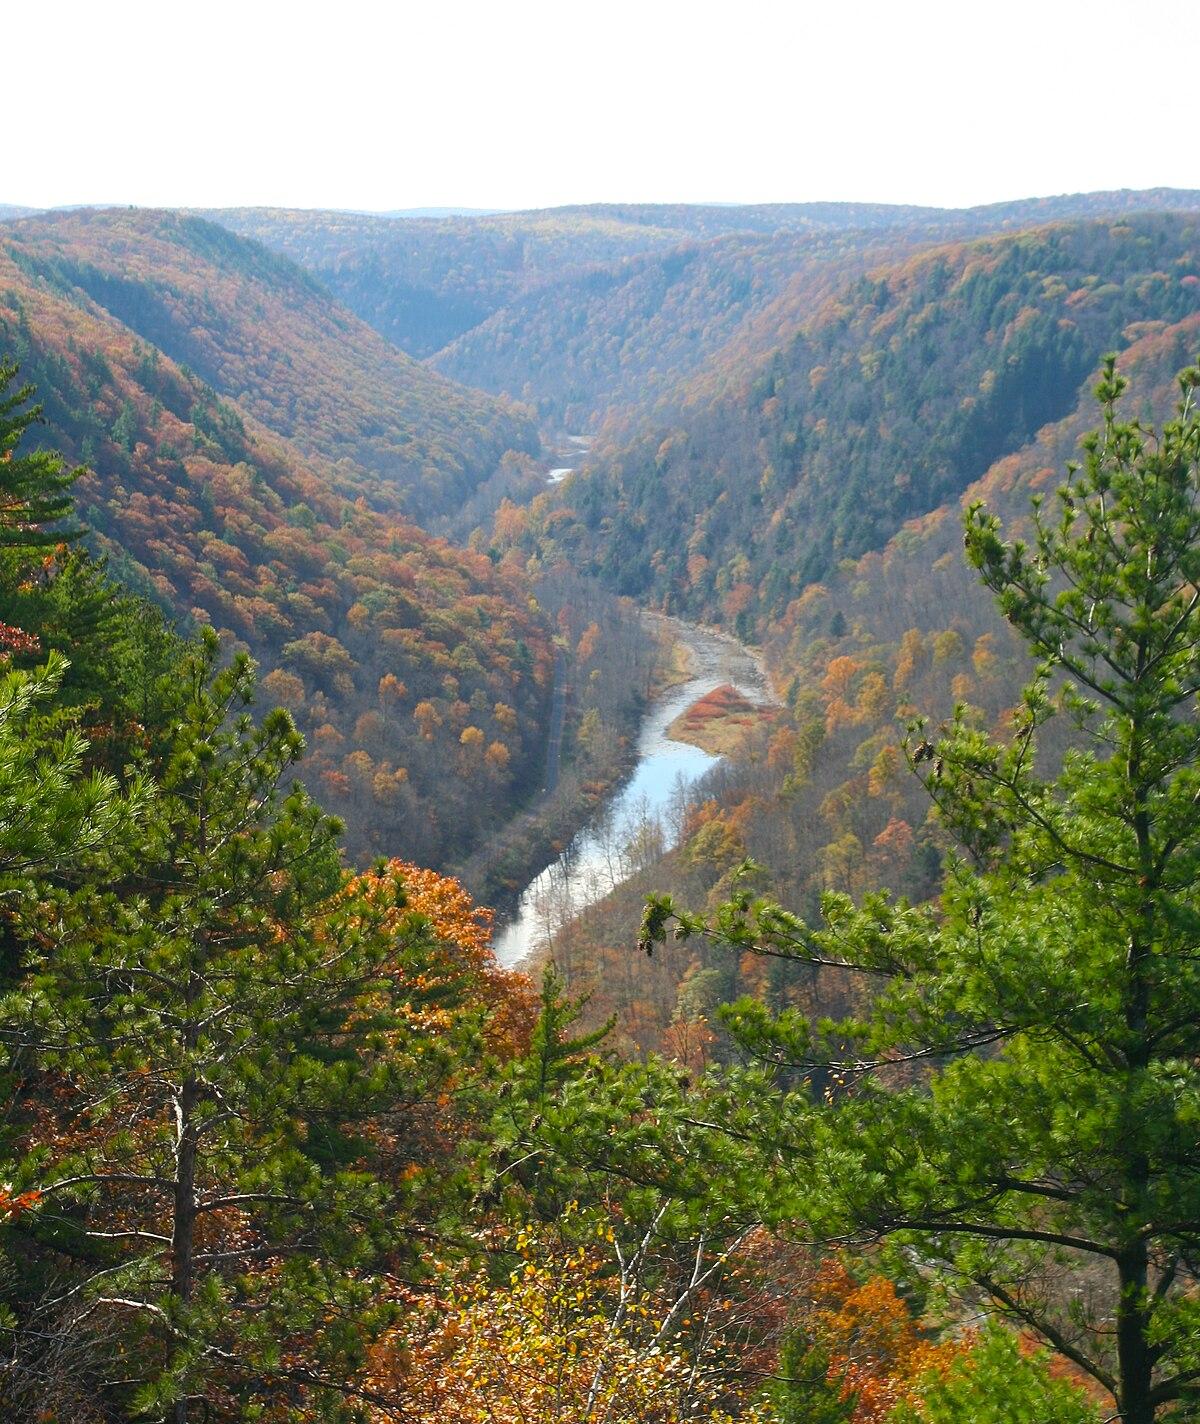 Pine Creek Gorge Wikipedia